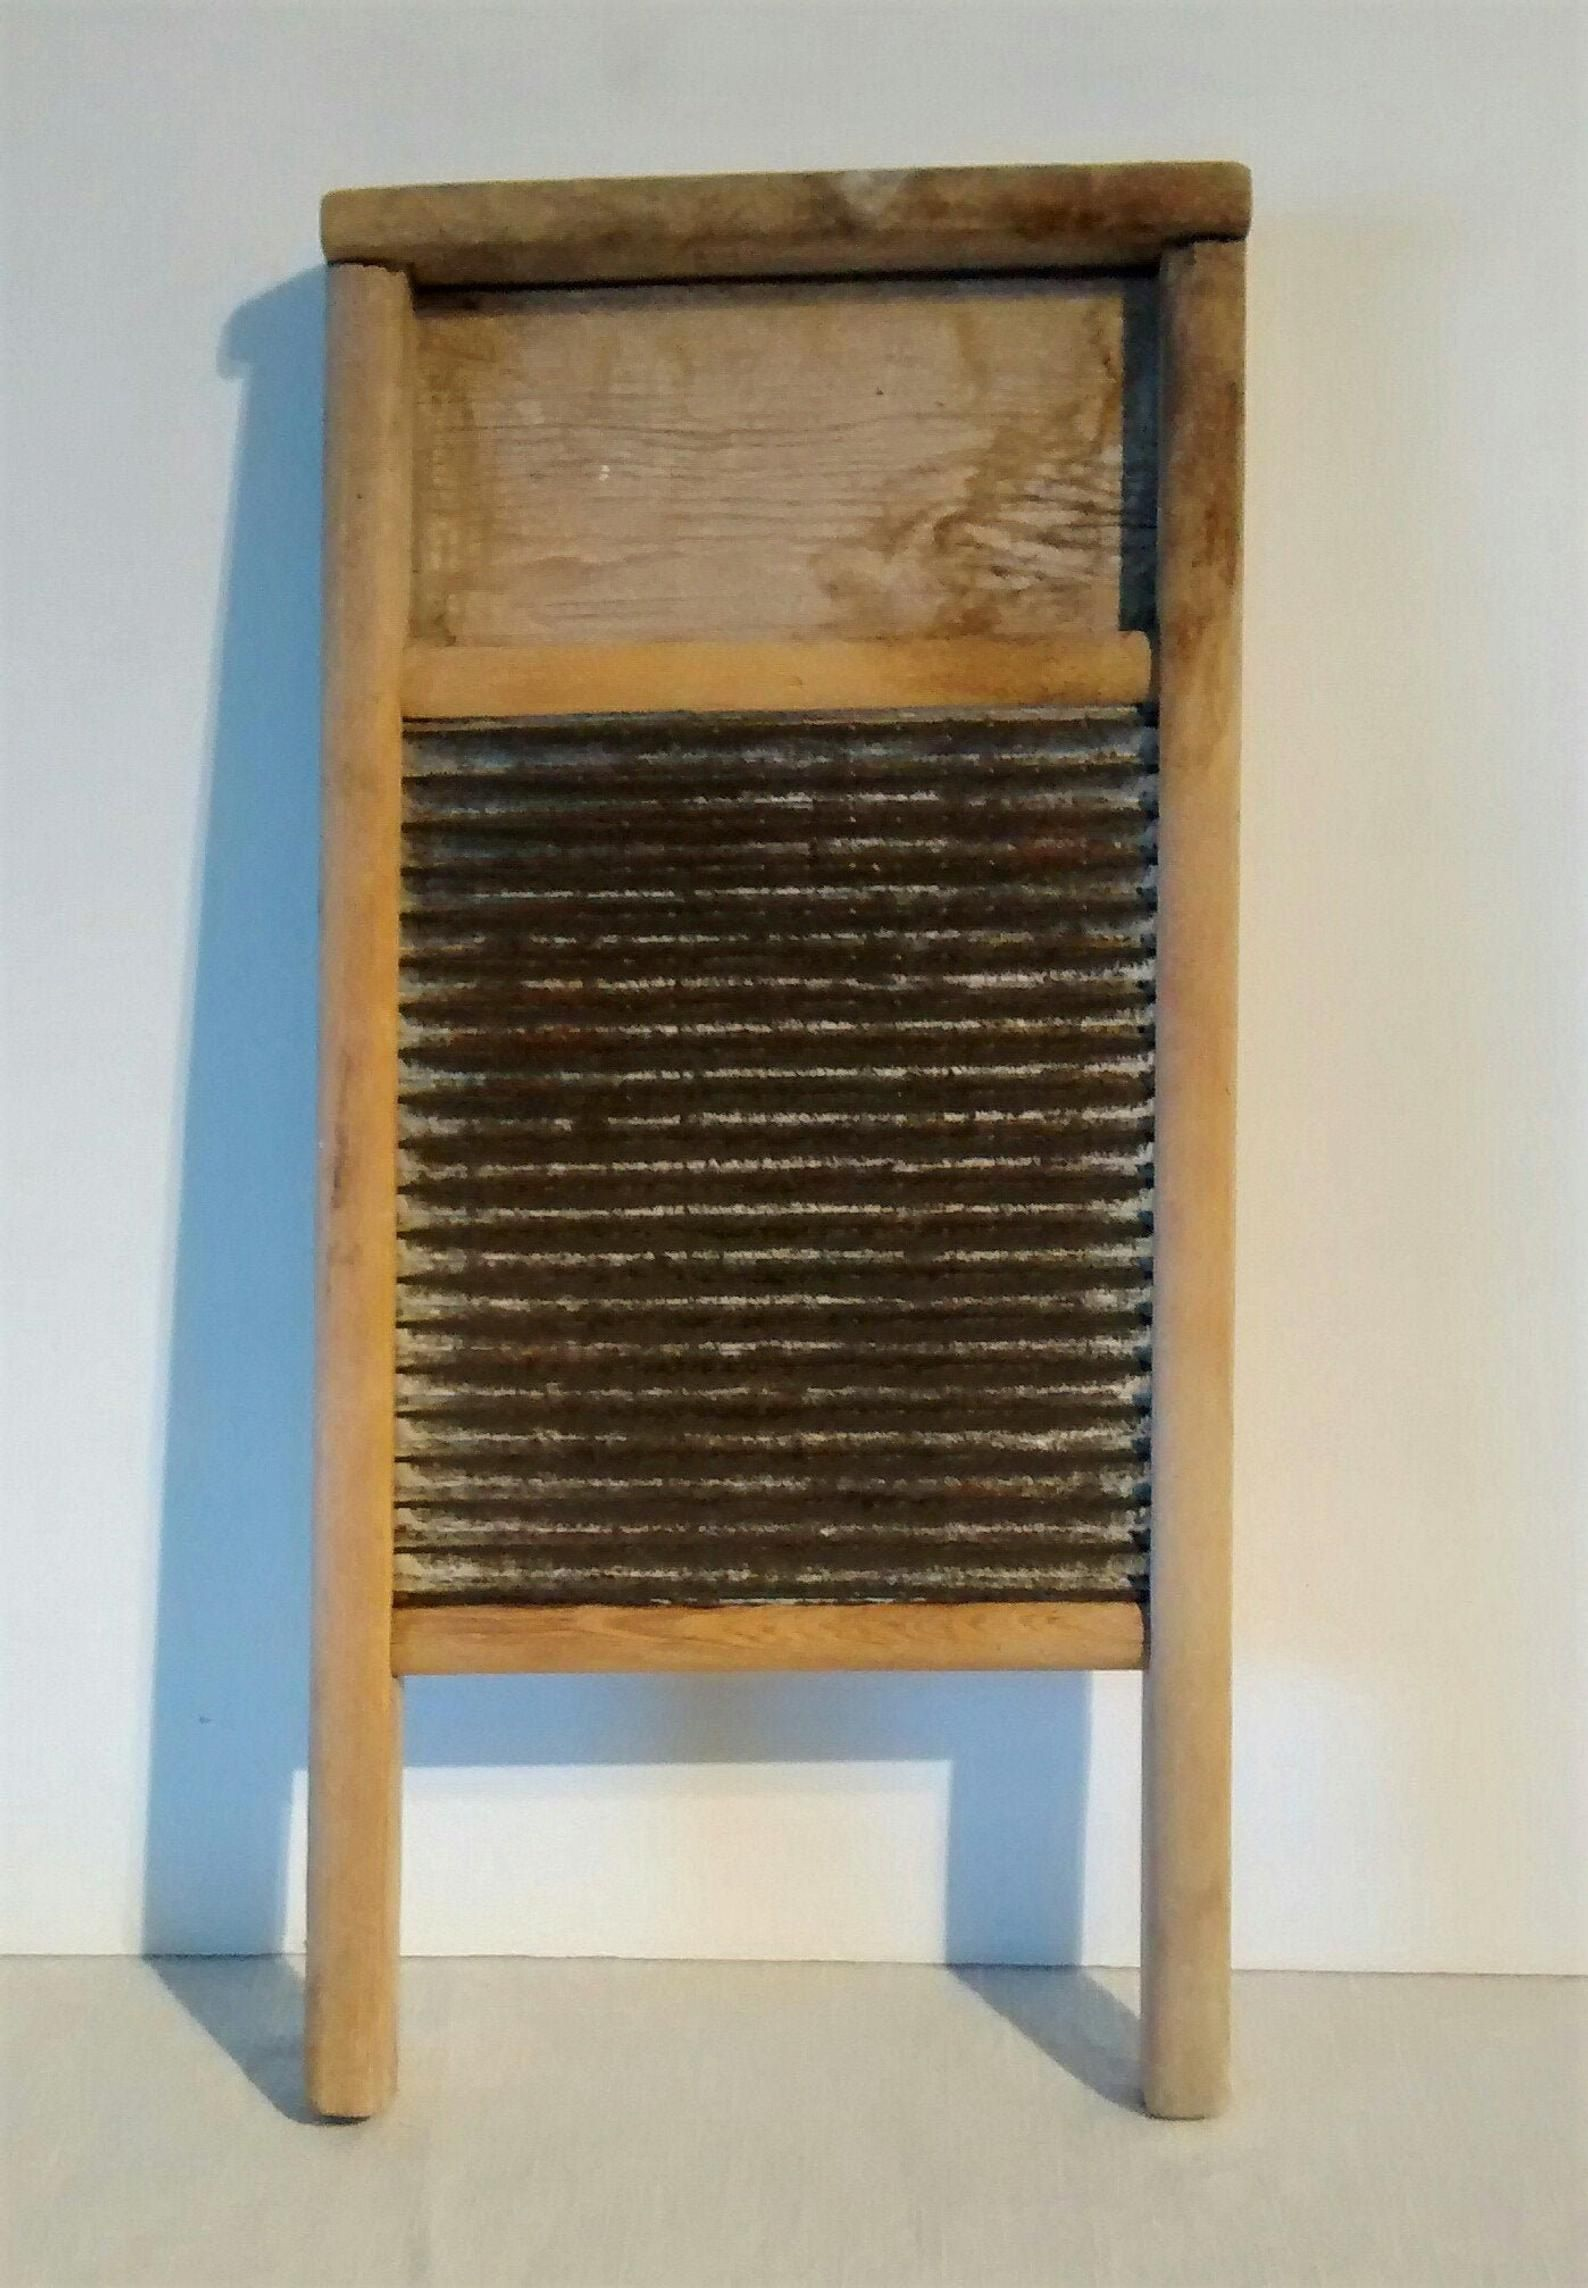 Wbg7 Bwbg7 Galvanized Washboard